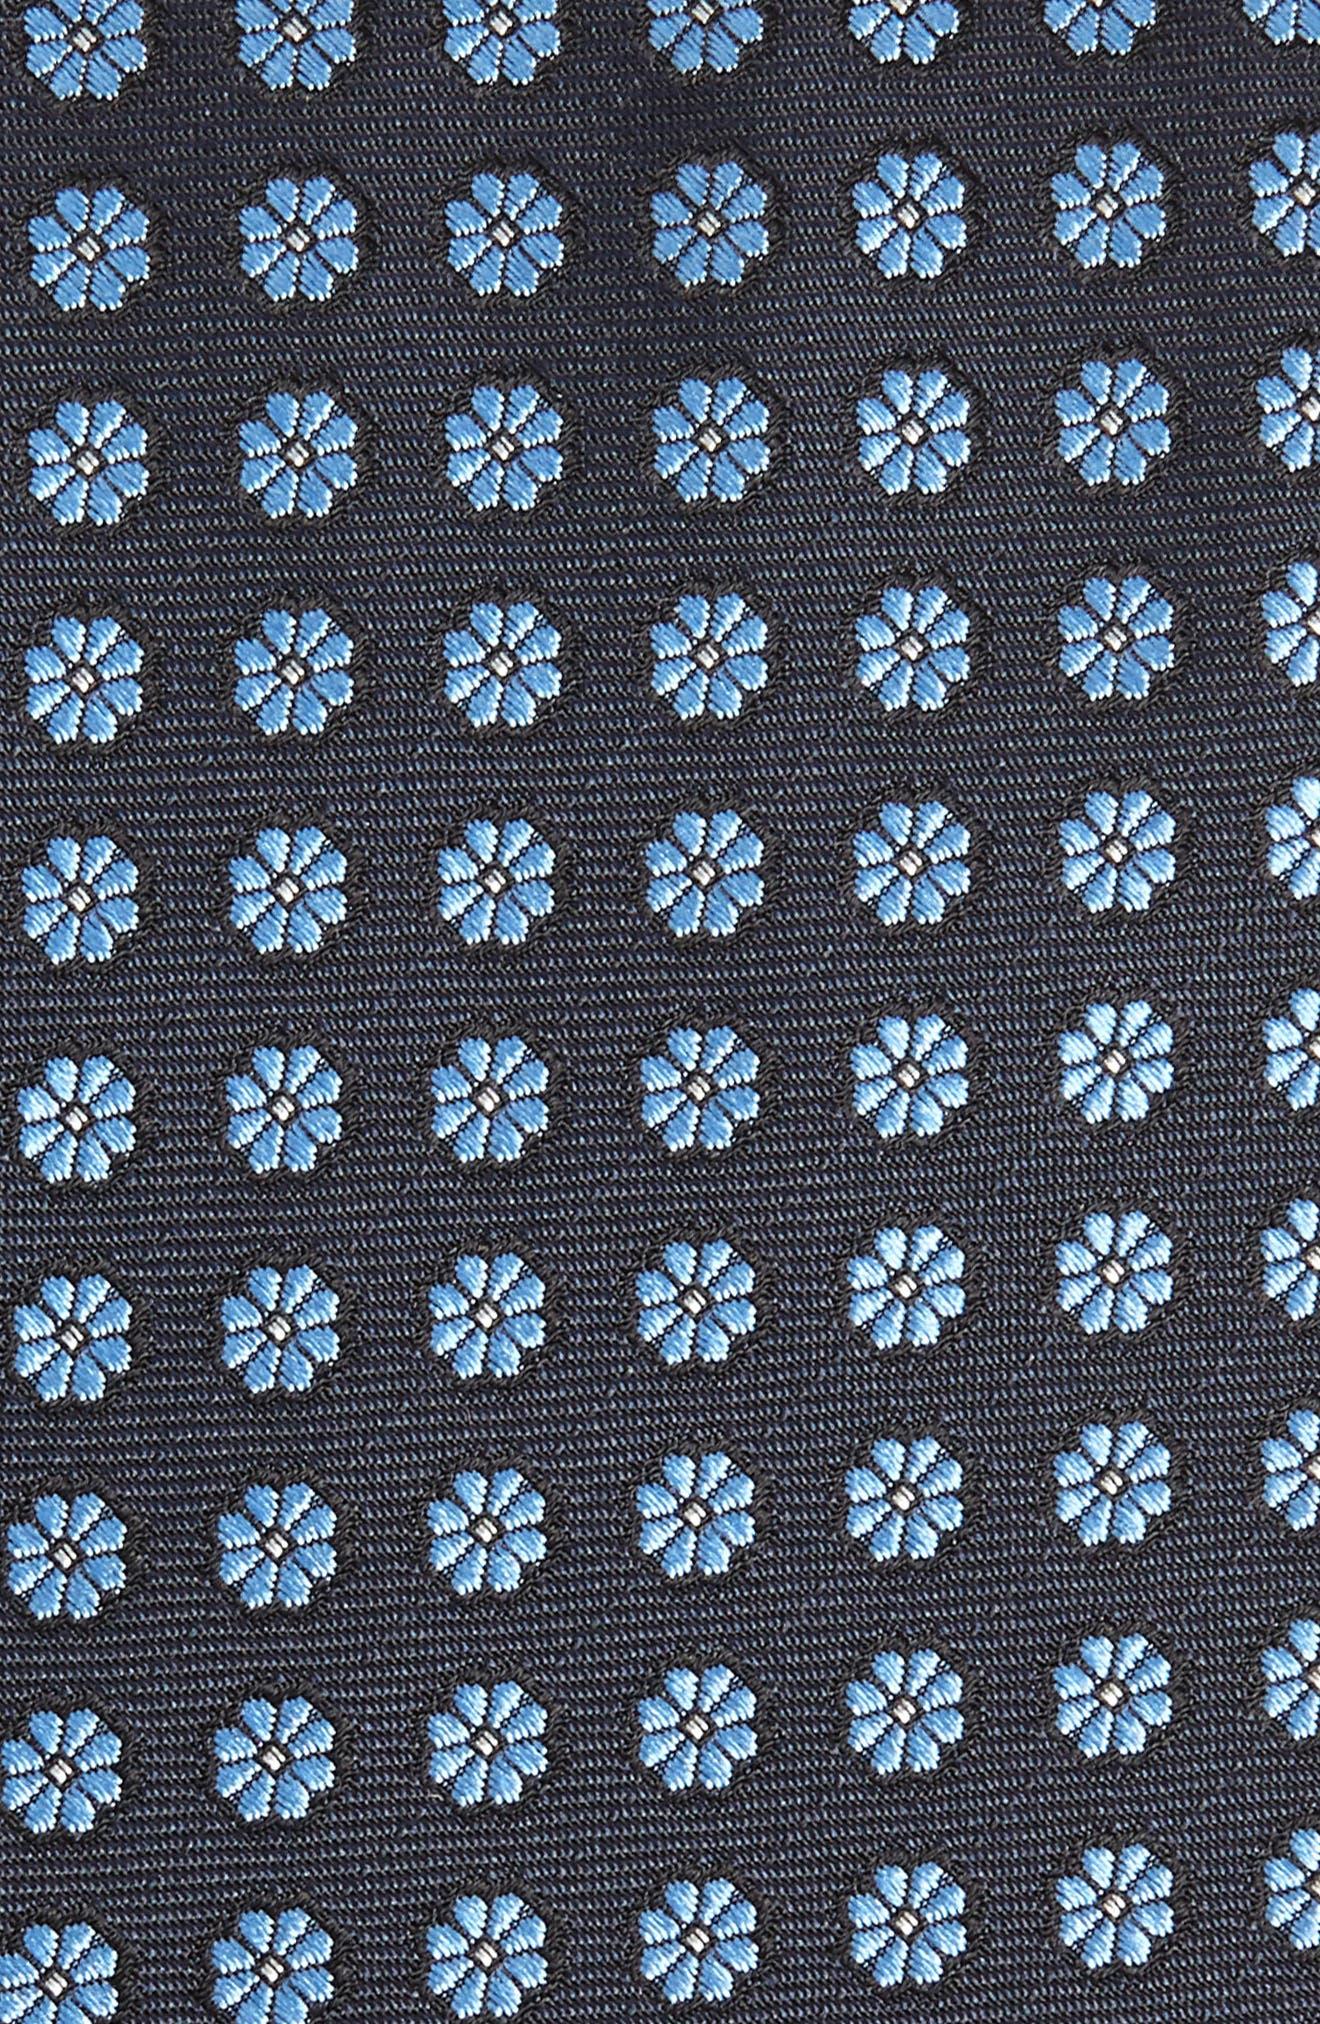 ERMENEGILDO ZEGNA, Floral Silk Tie, Alternate thumbnail 2, color, BLUE/ NAVY